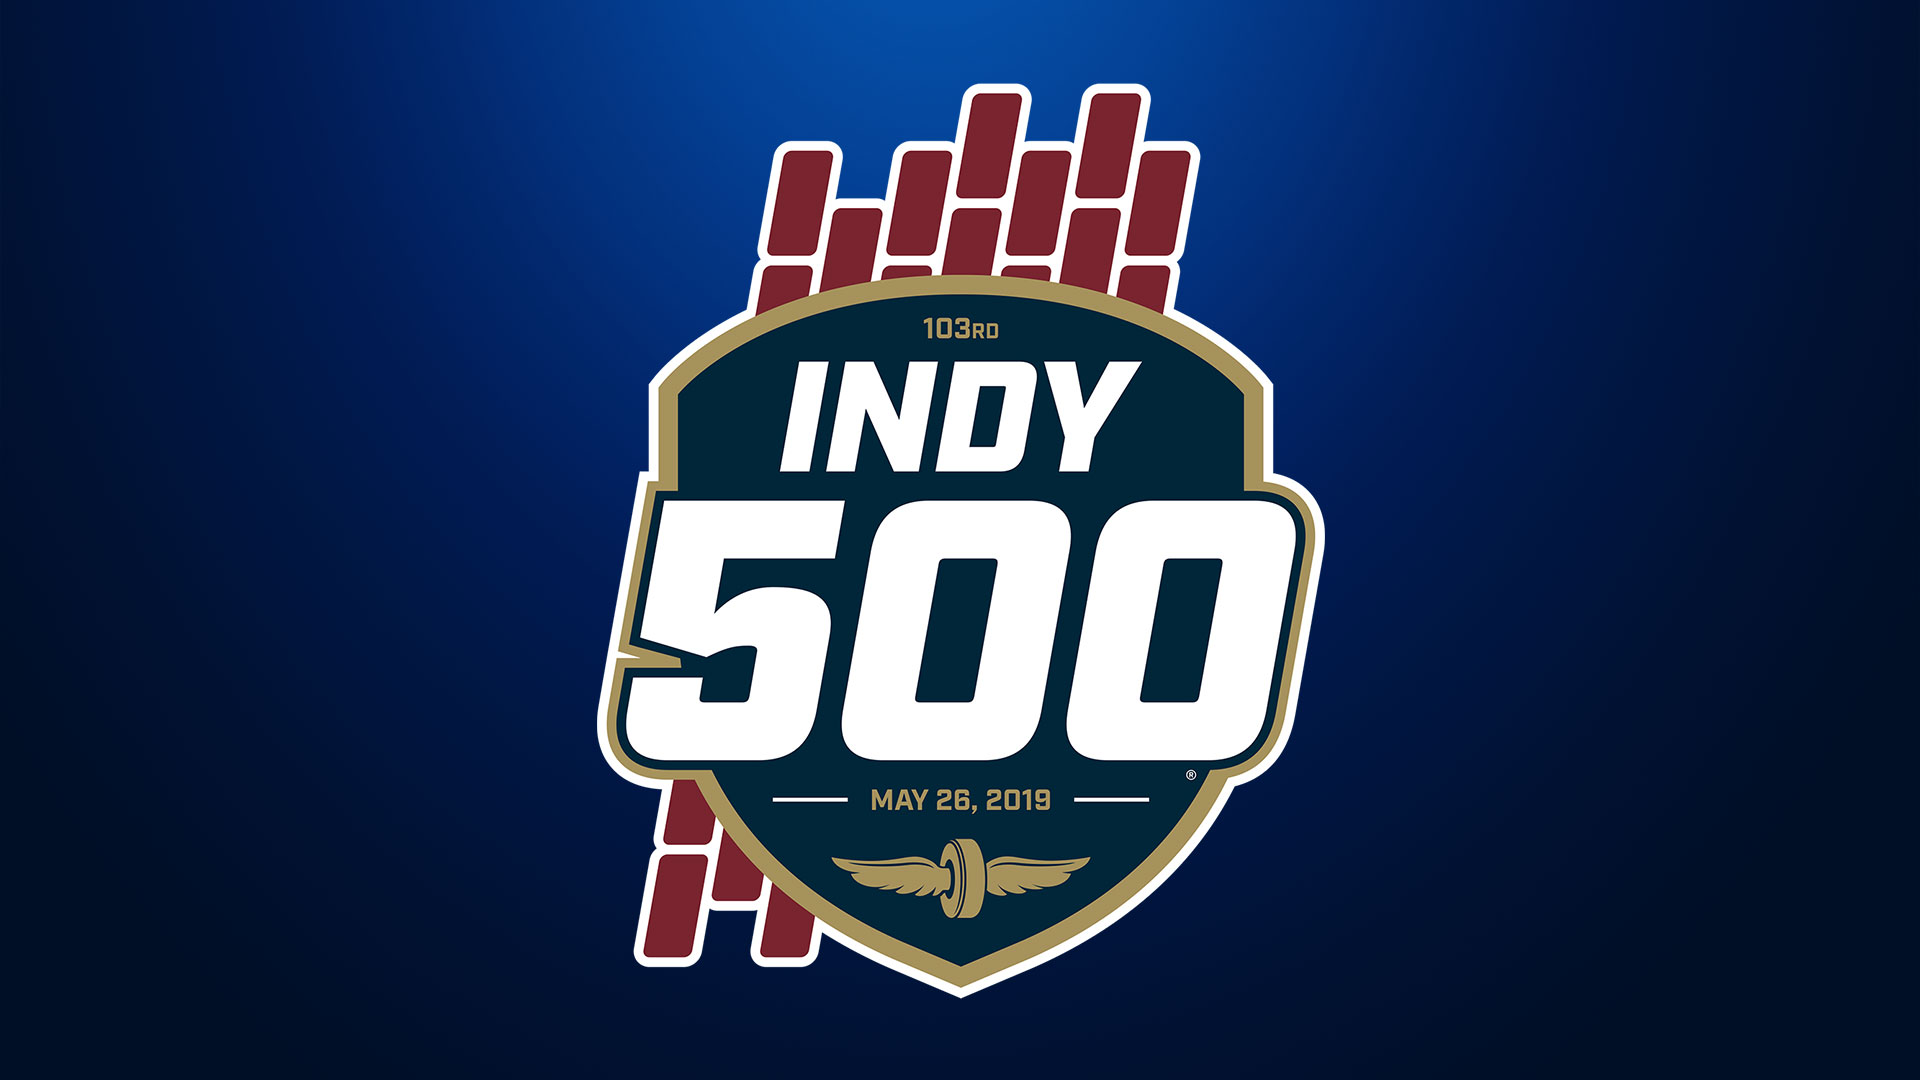 KELO Indy 500